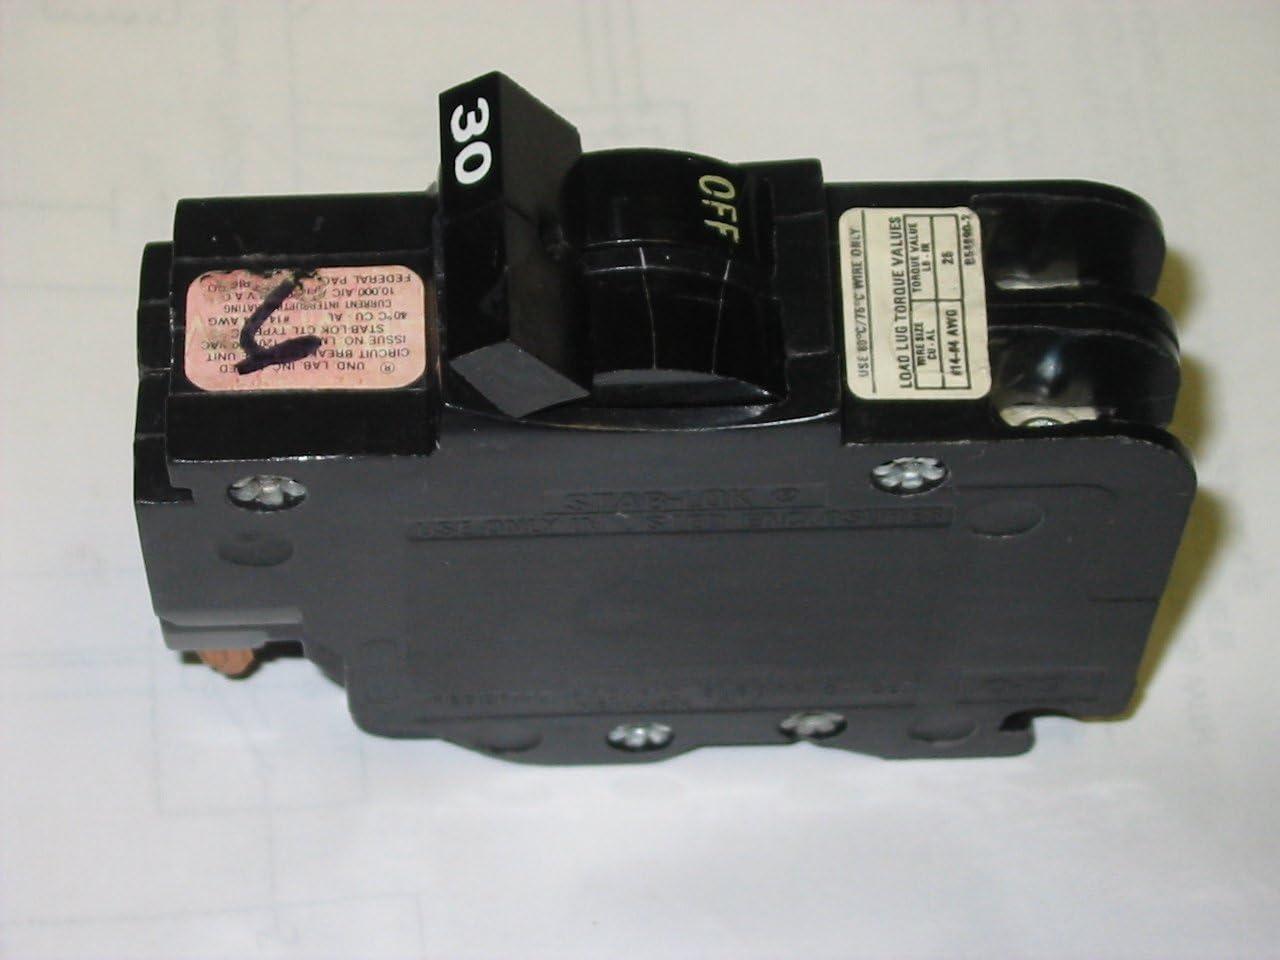 stab-lok CU-AL 1 pole 30 amp circuit breaker